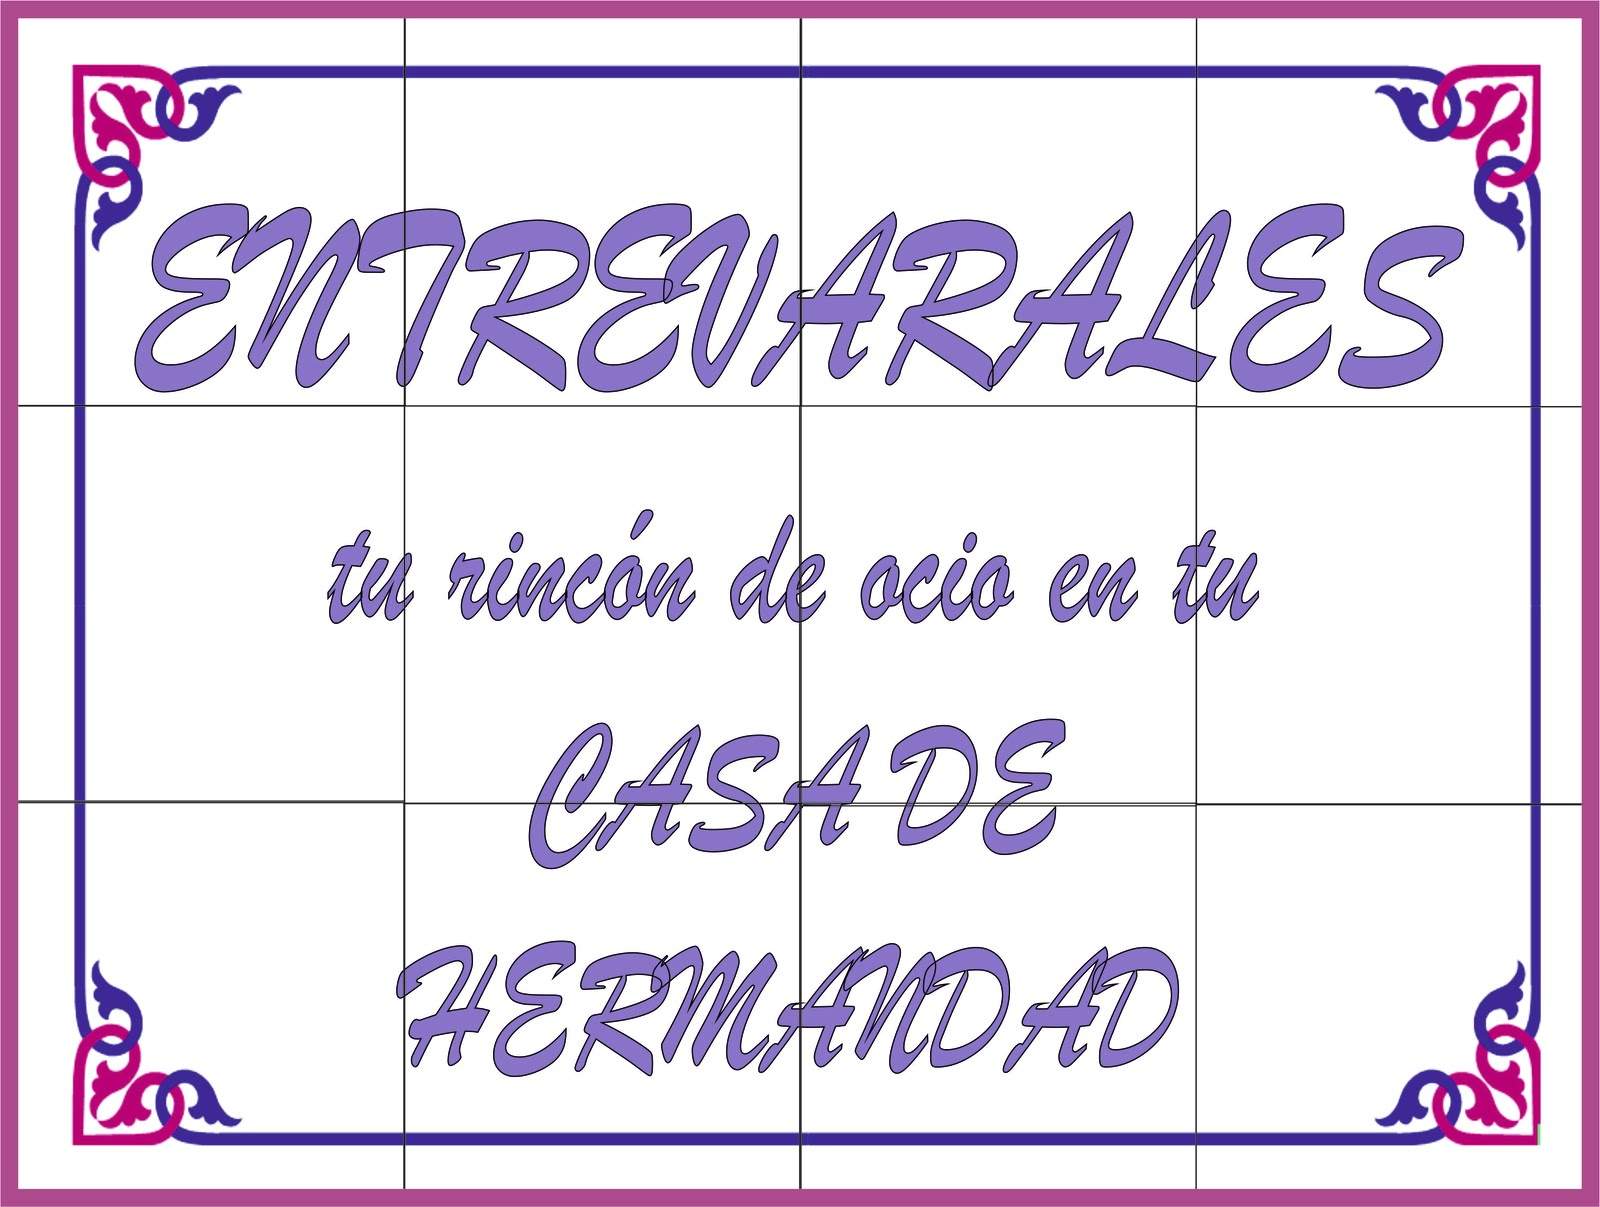 CASA HERMANDAD